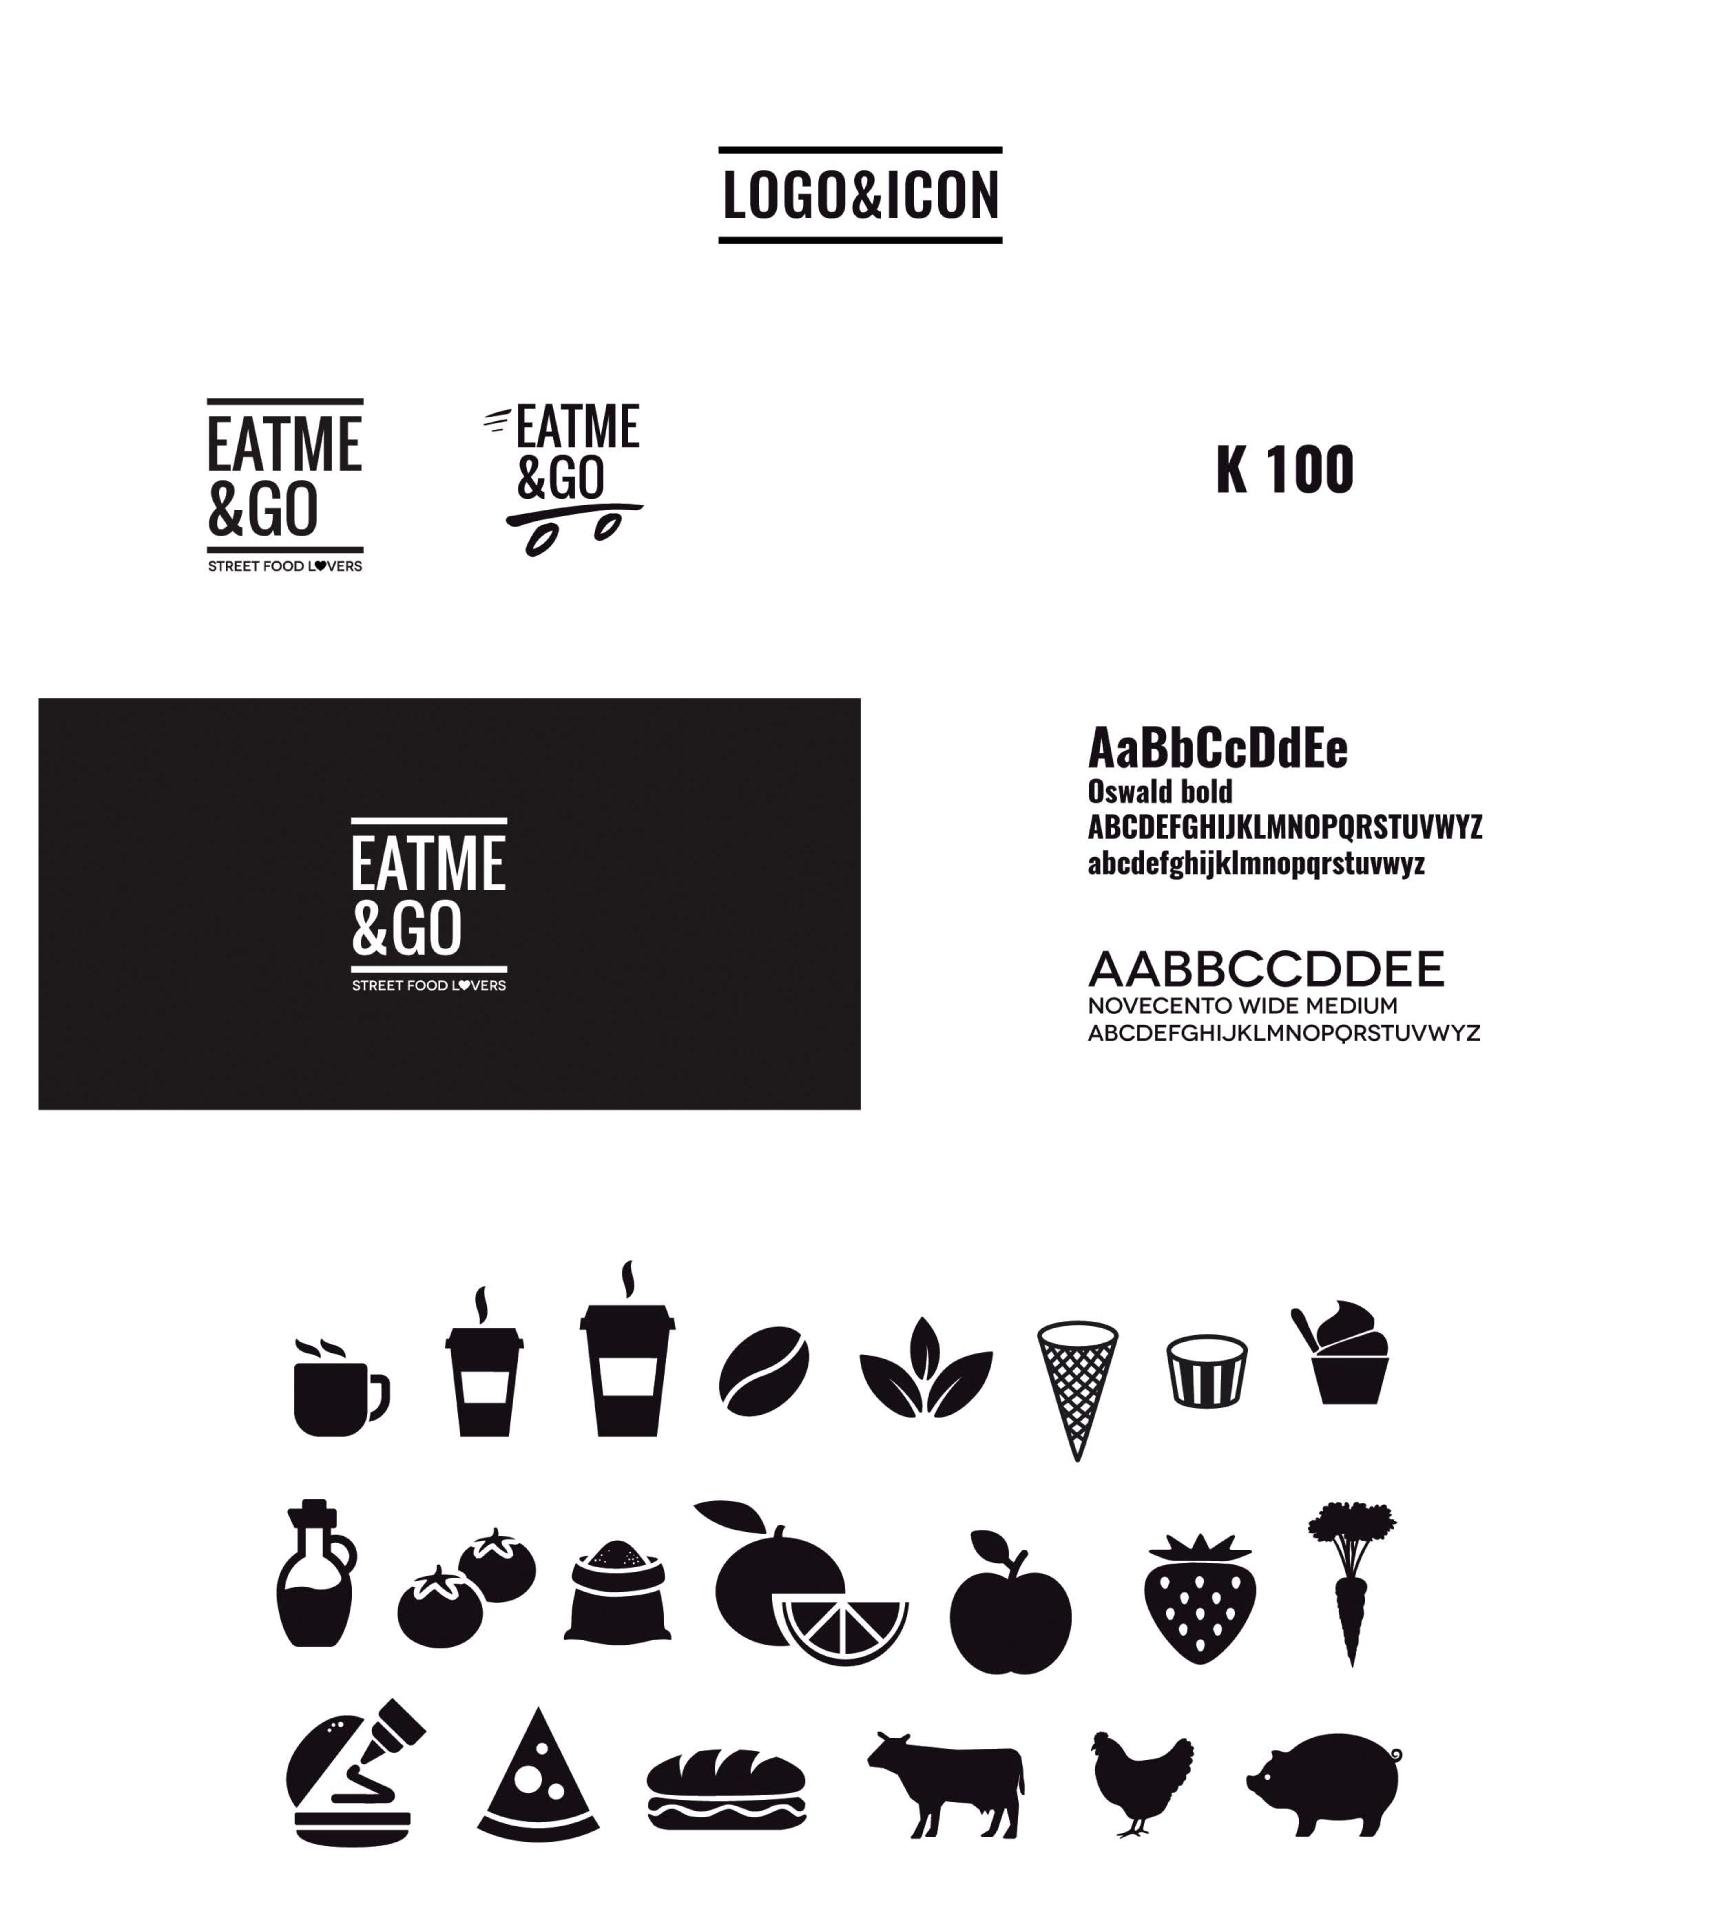 mintlab-brandidentyty-eatme&go-Logo-icon